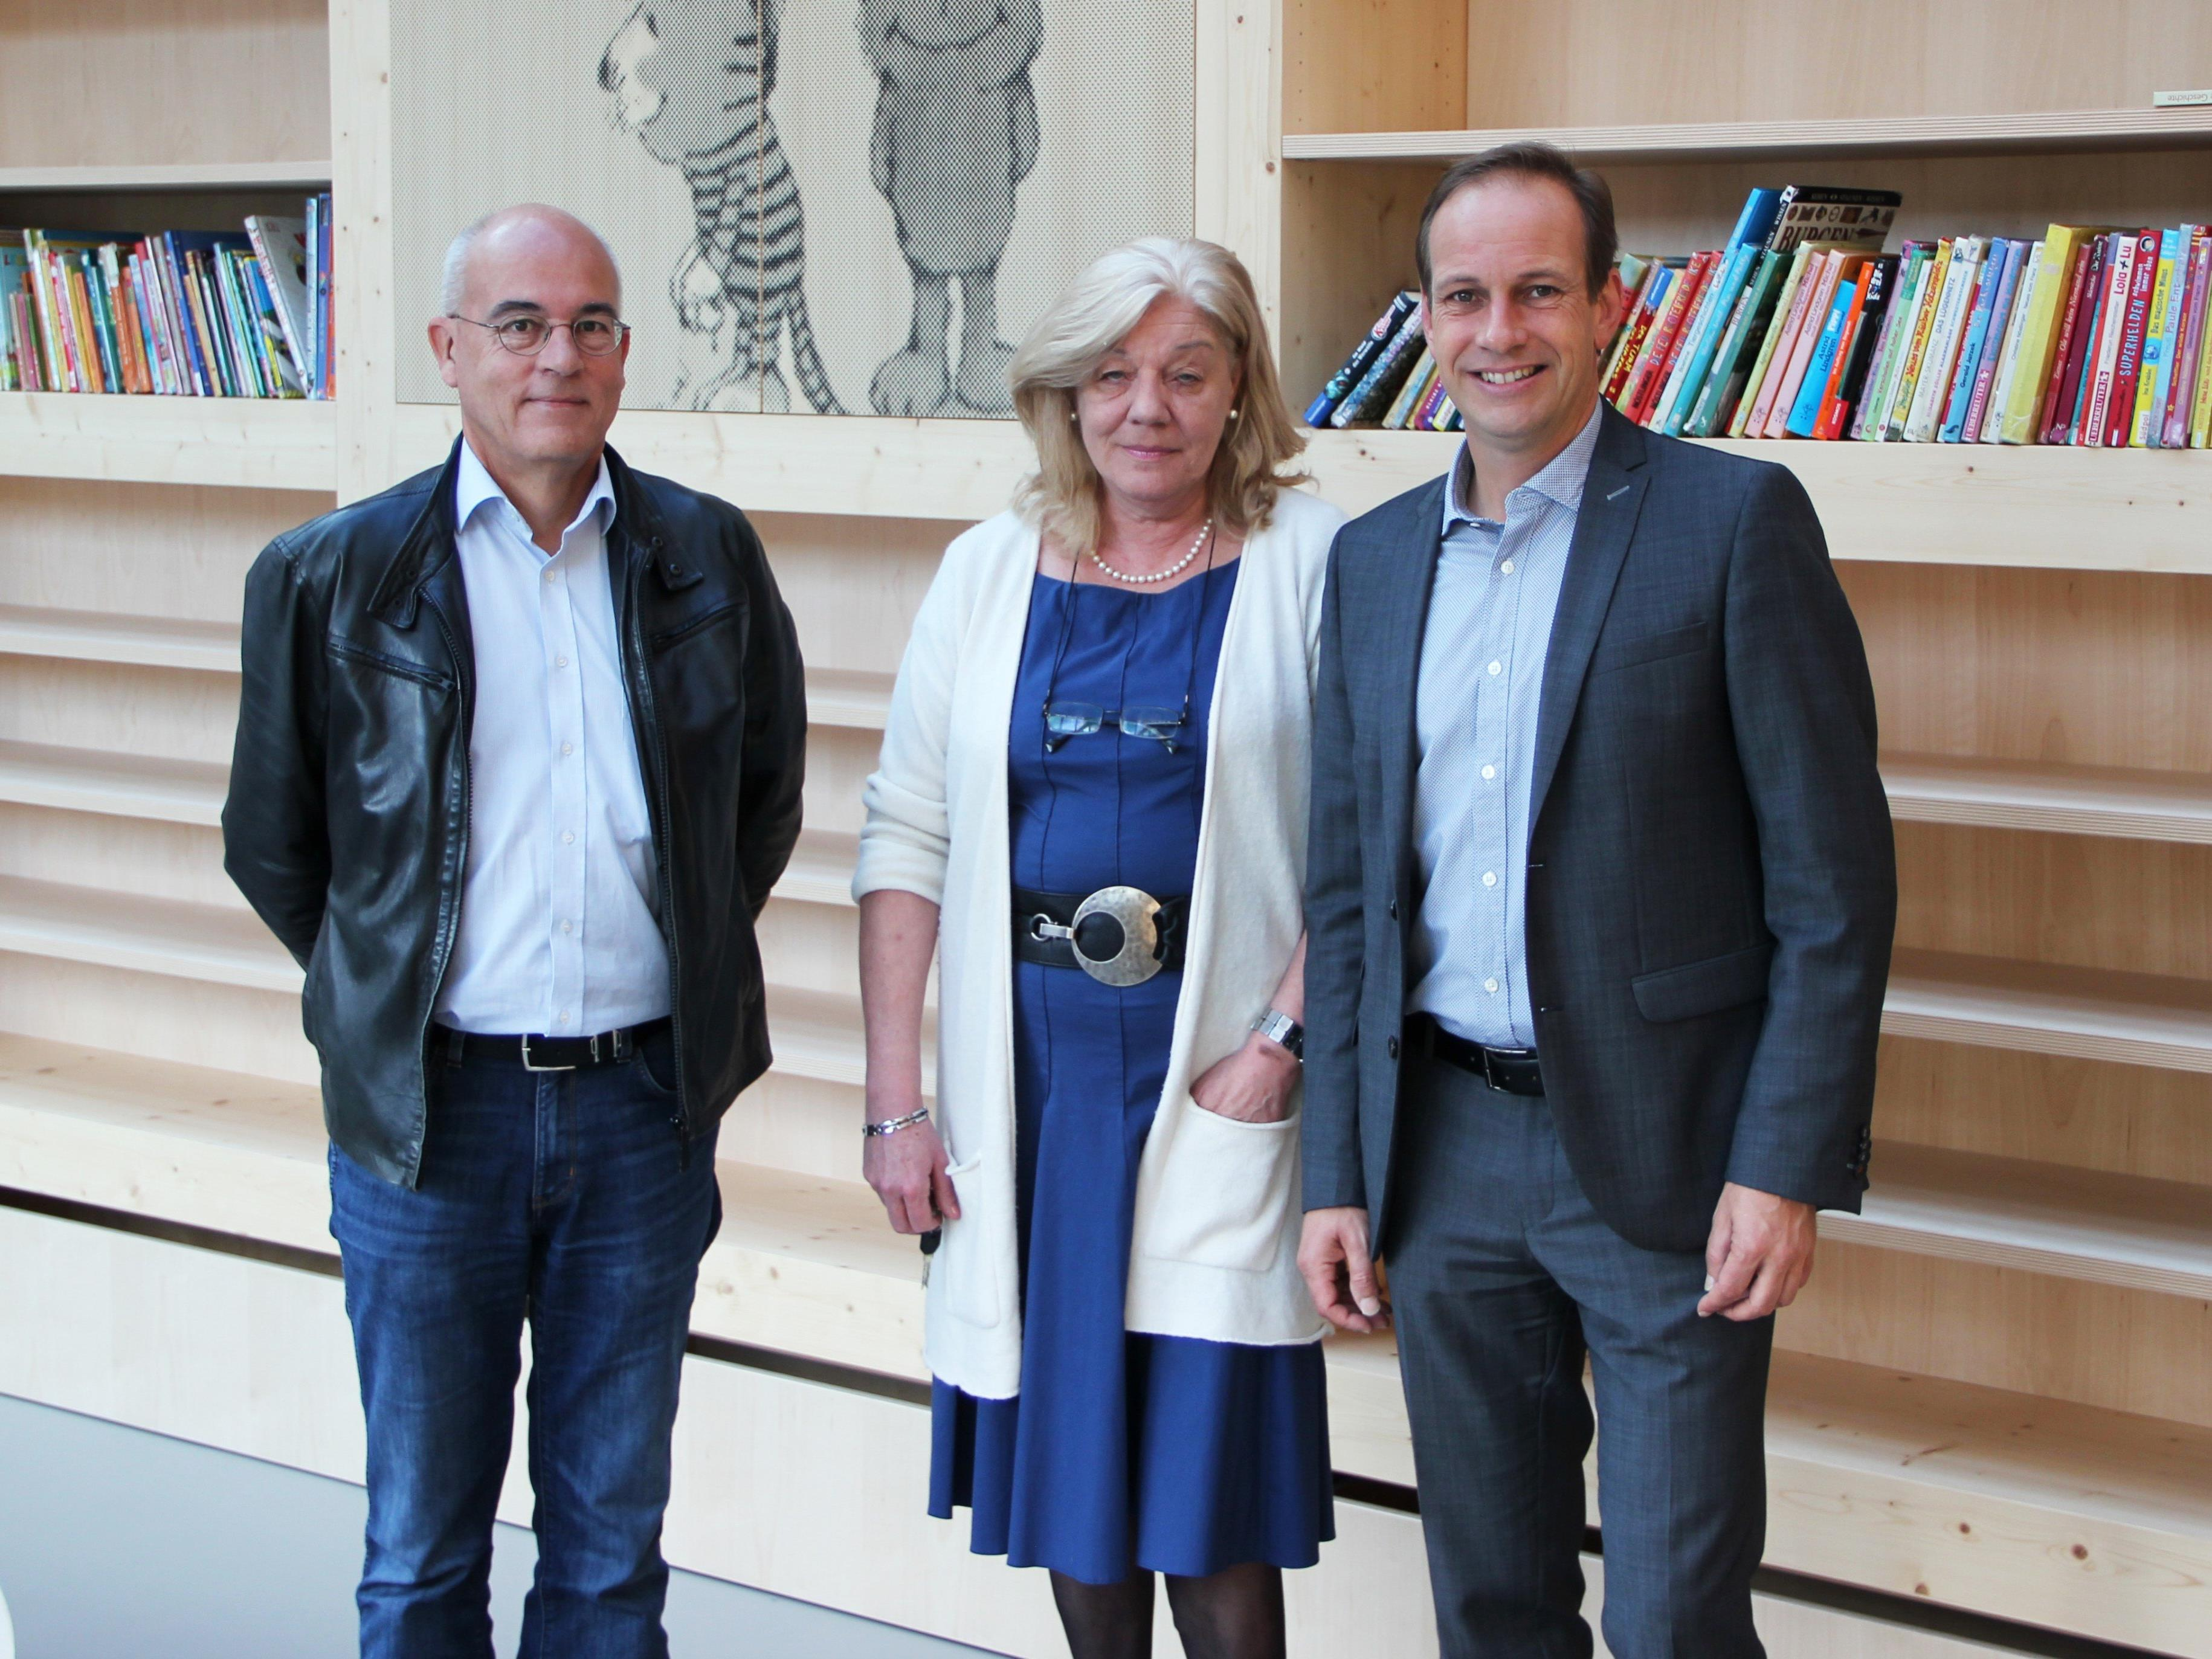 v. l. DI Markus Heinzle, Direktorin Ulrike Fleisch, Bürgermeister Dieter Egger